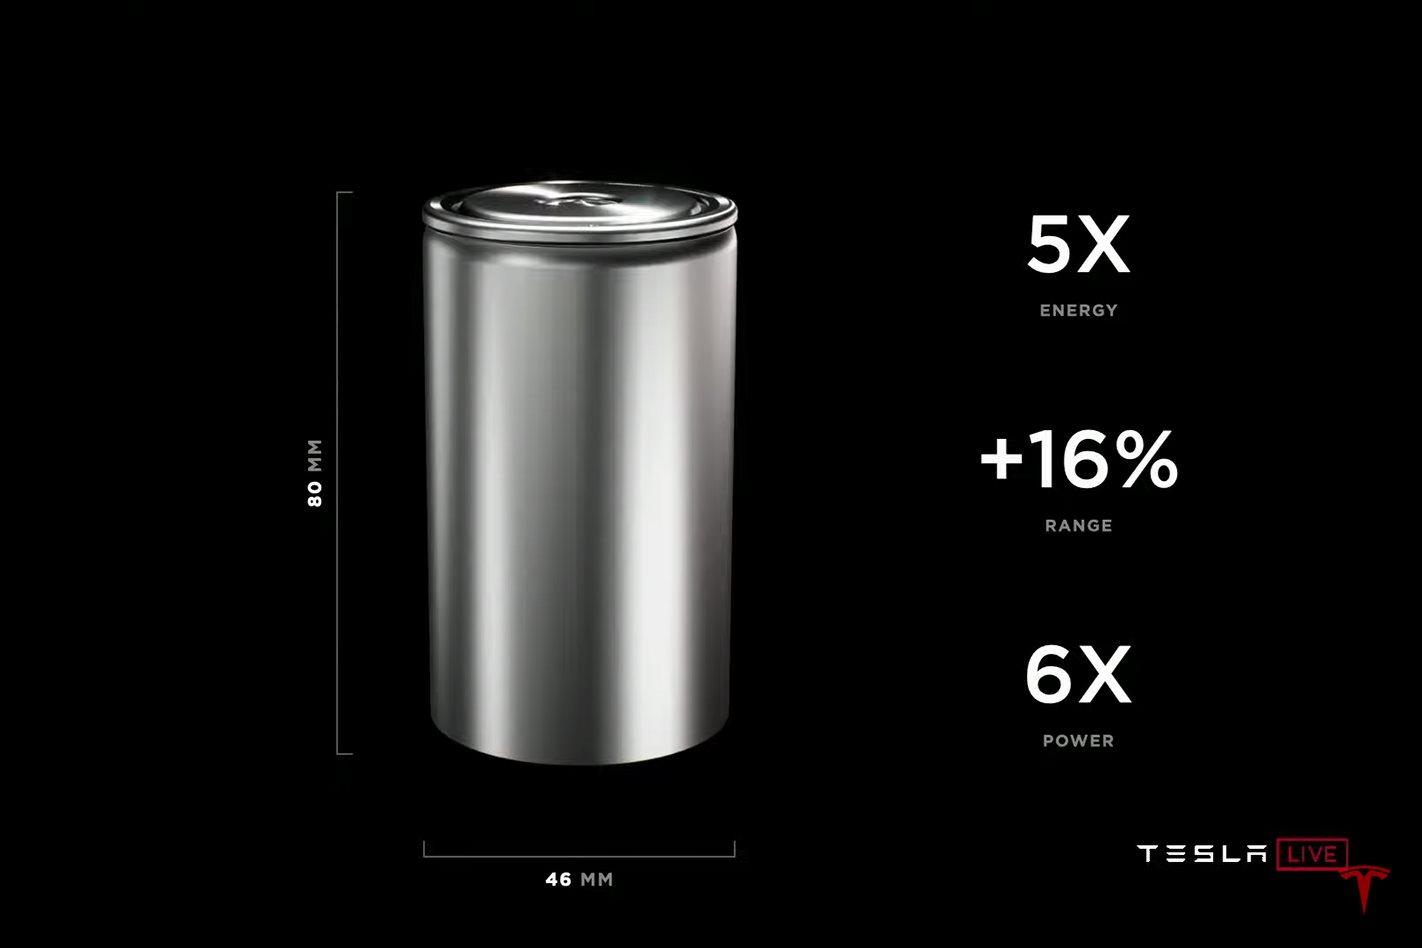 New Tesla battery